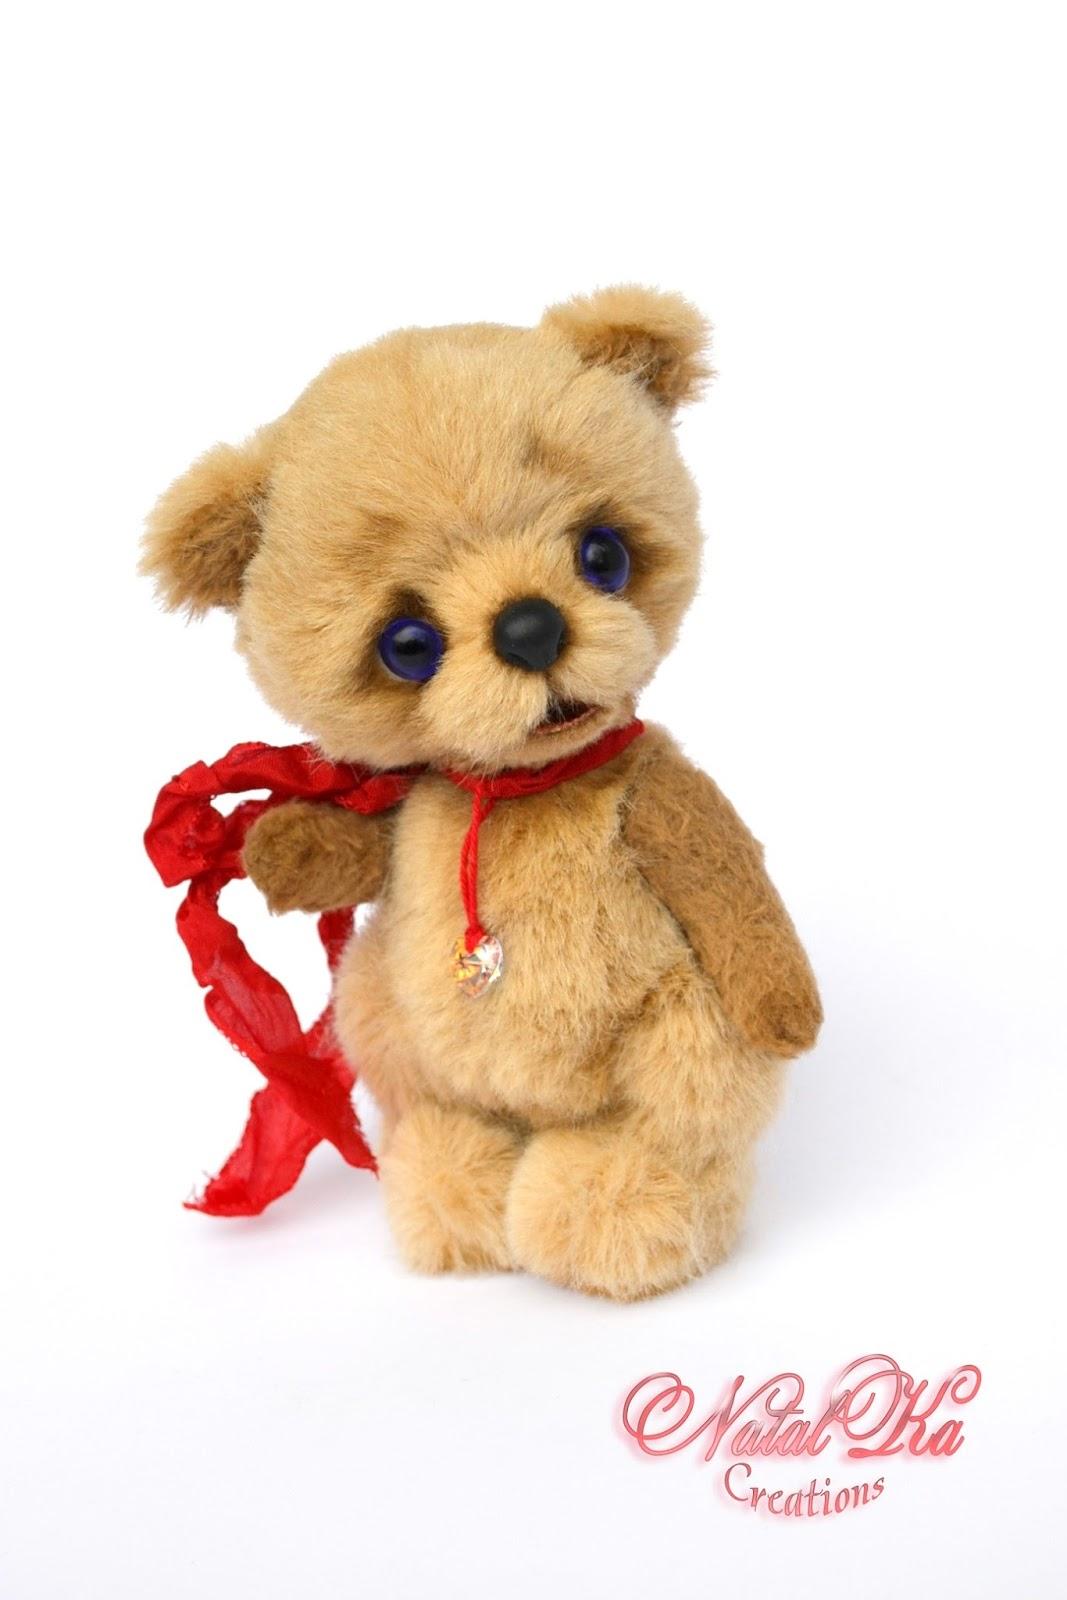 Artist teddy bear, teddy bear jointed, teddies with charm, handmade teddy bear, ooak, Künstlerteddy, Teddybär, Teddy, Bär, Unikat, авторский мишка тедди, медвежонок тедди, медведь тедди, мишки тедди, ручная работа от NatalKa Creations